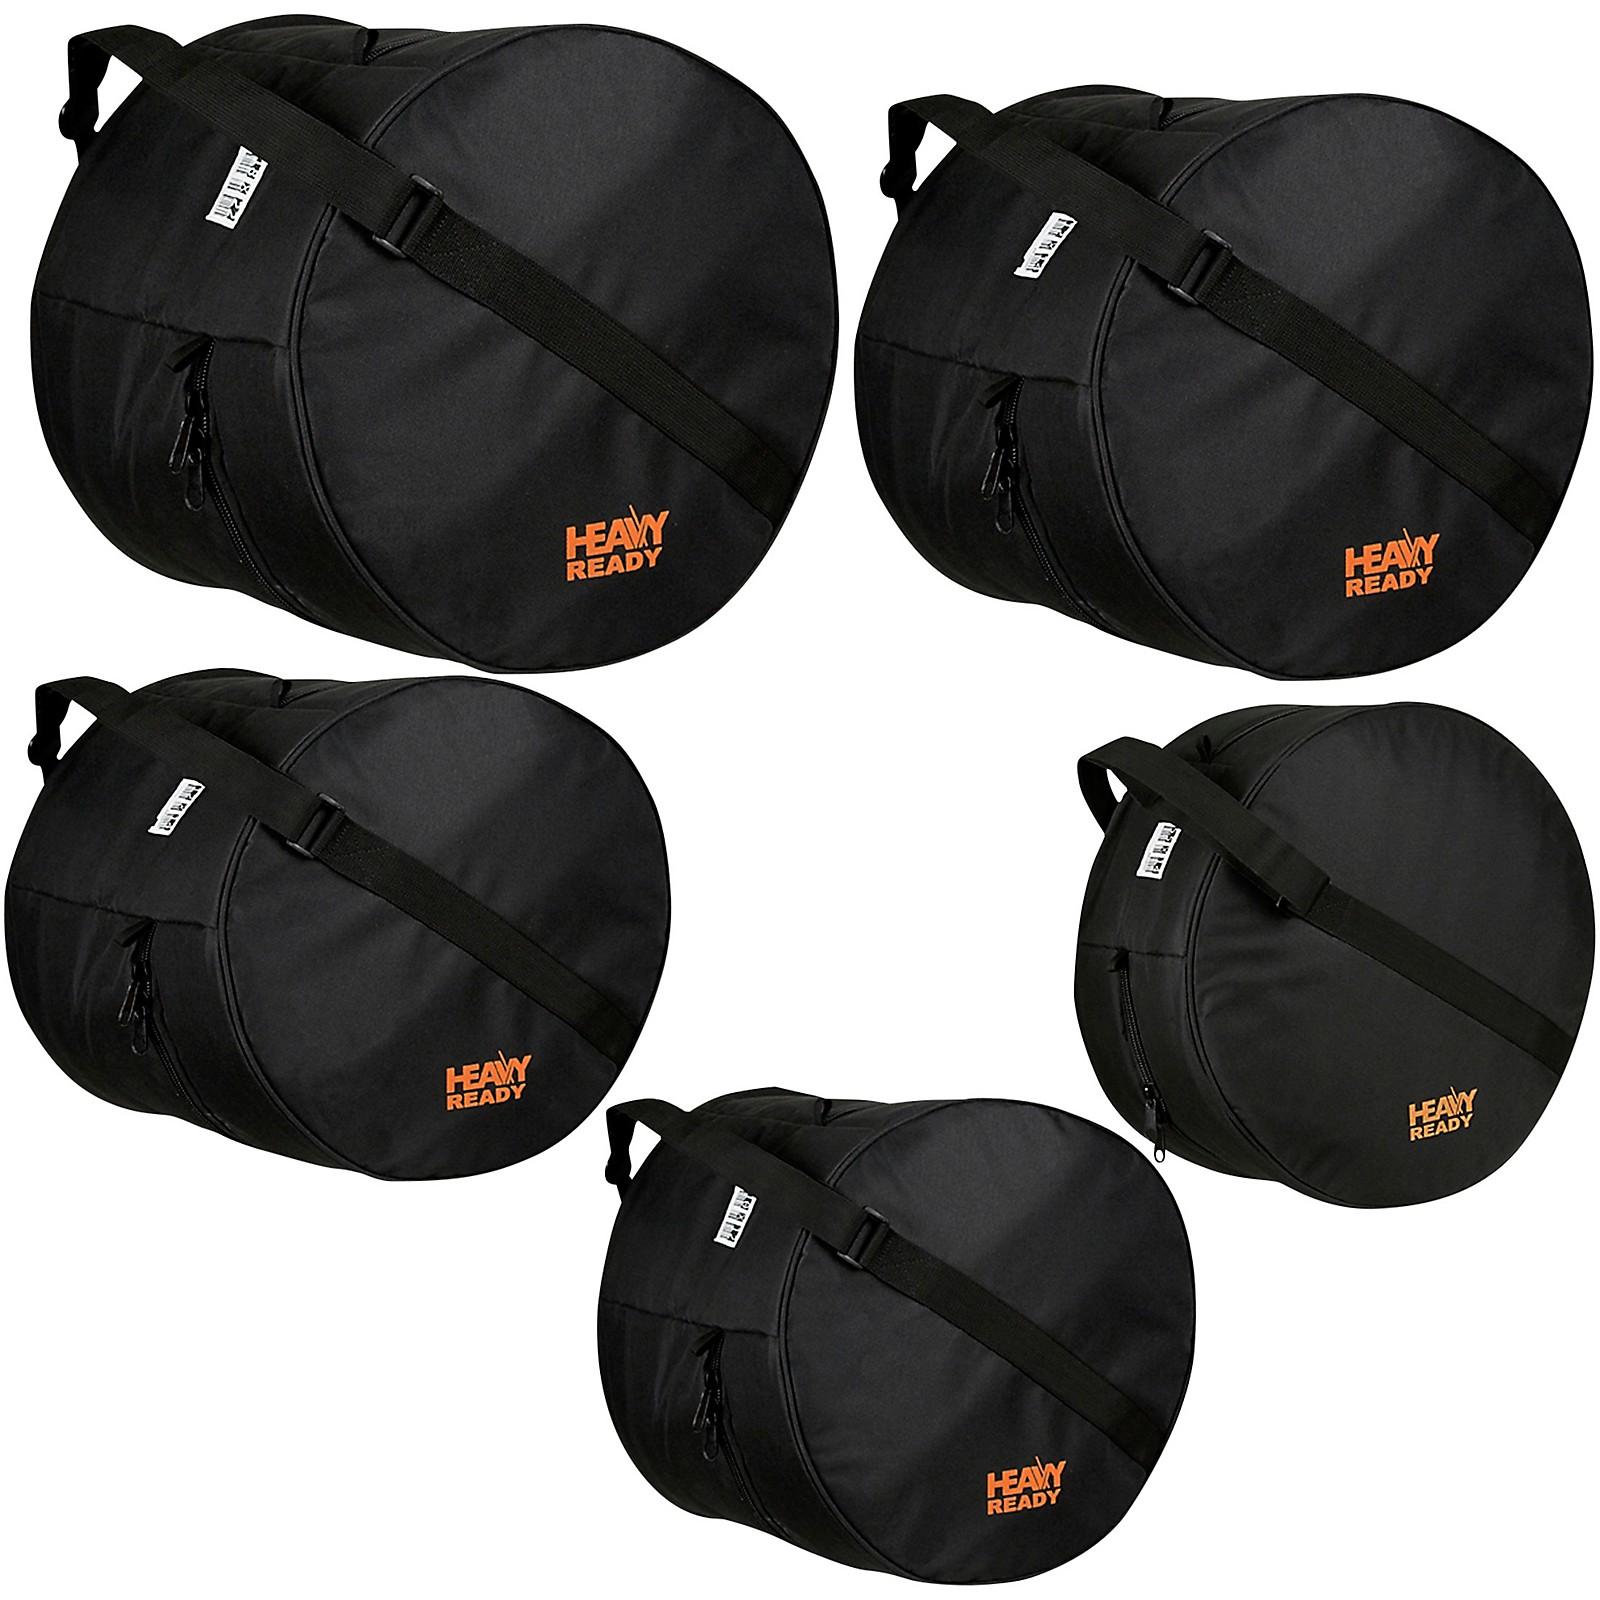 Protec Heavy Ready Series Fusion 2 Drum Bag Set